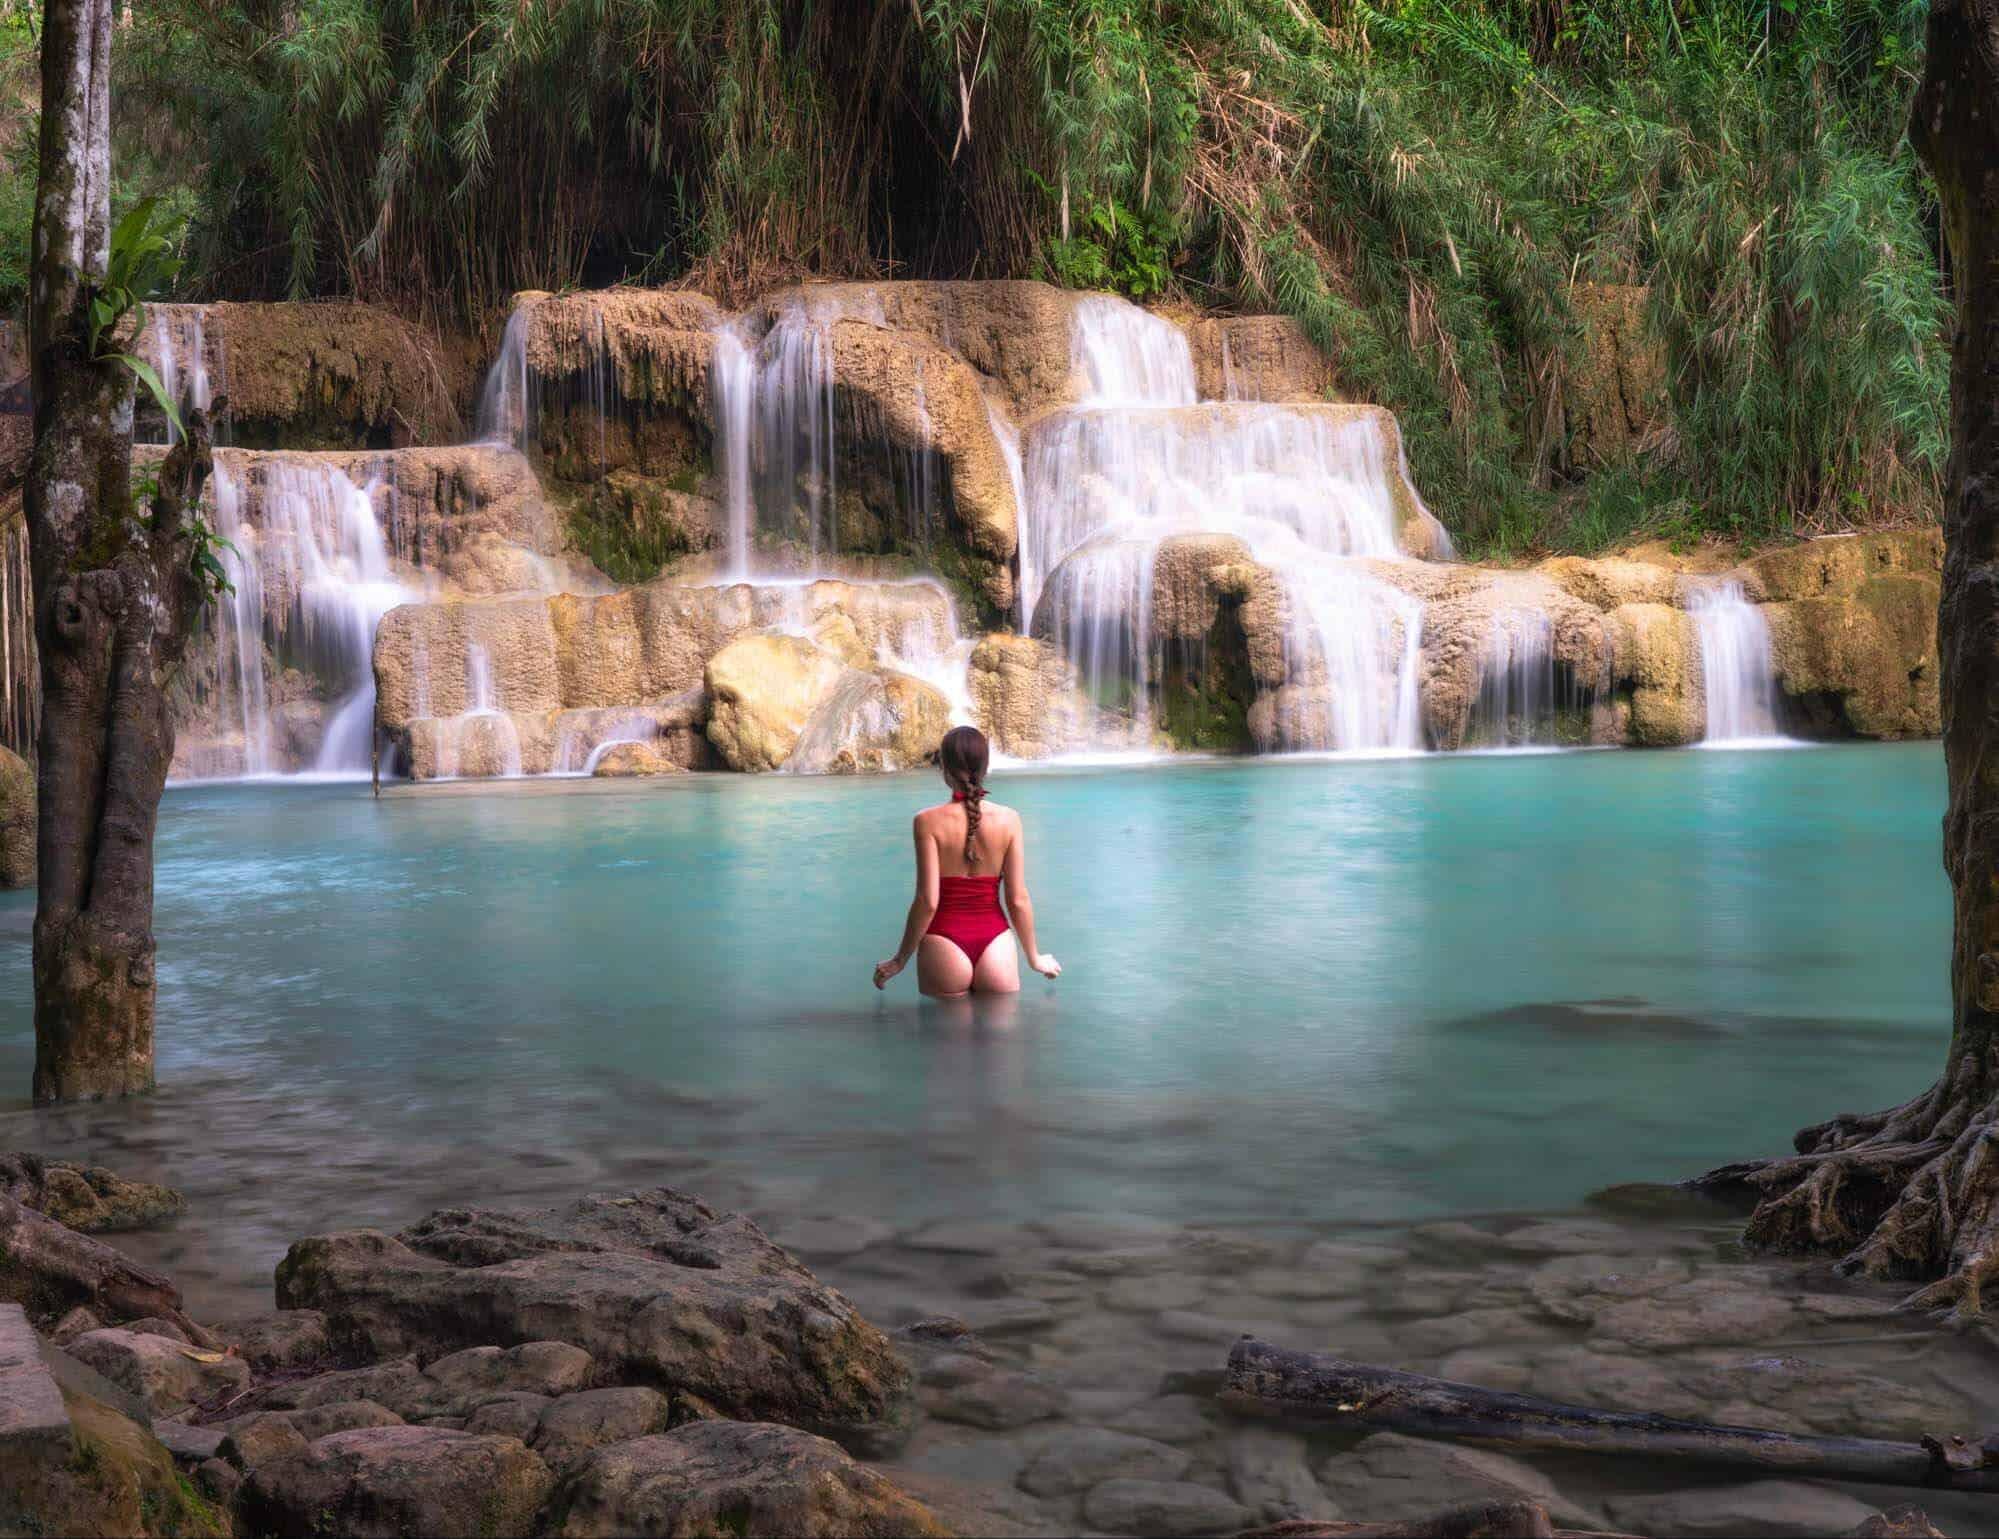 Travels of Sophie swimming at Kuang Si Falls